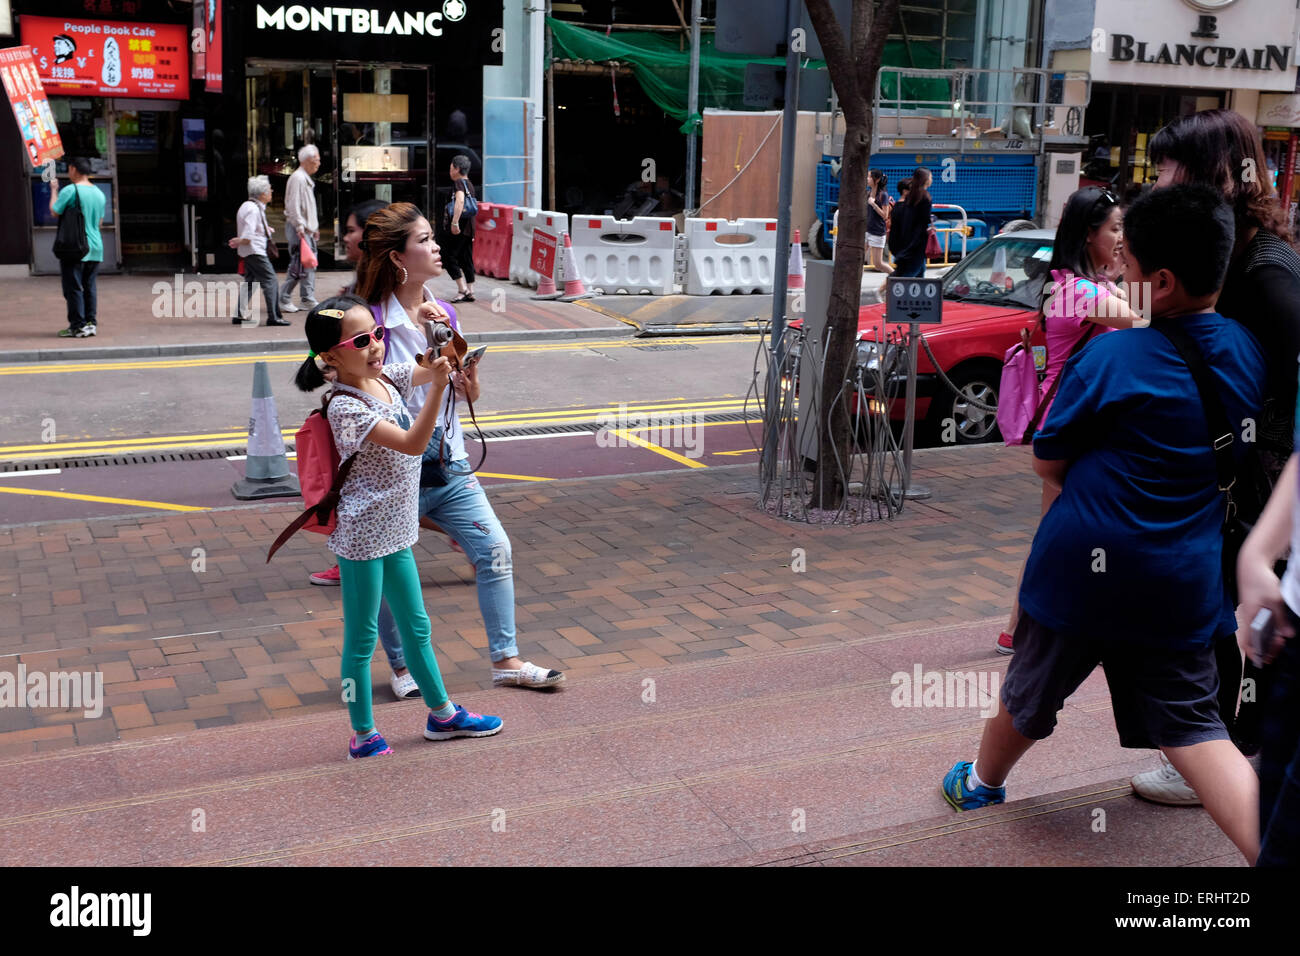 Tourists taking pictures in Causeway Bay, Hong Kong SAR, China - Stock Image